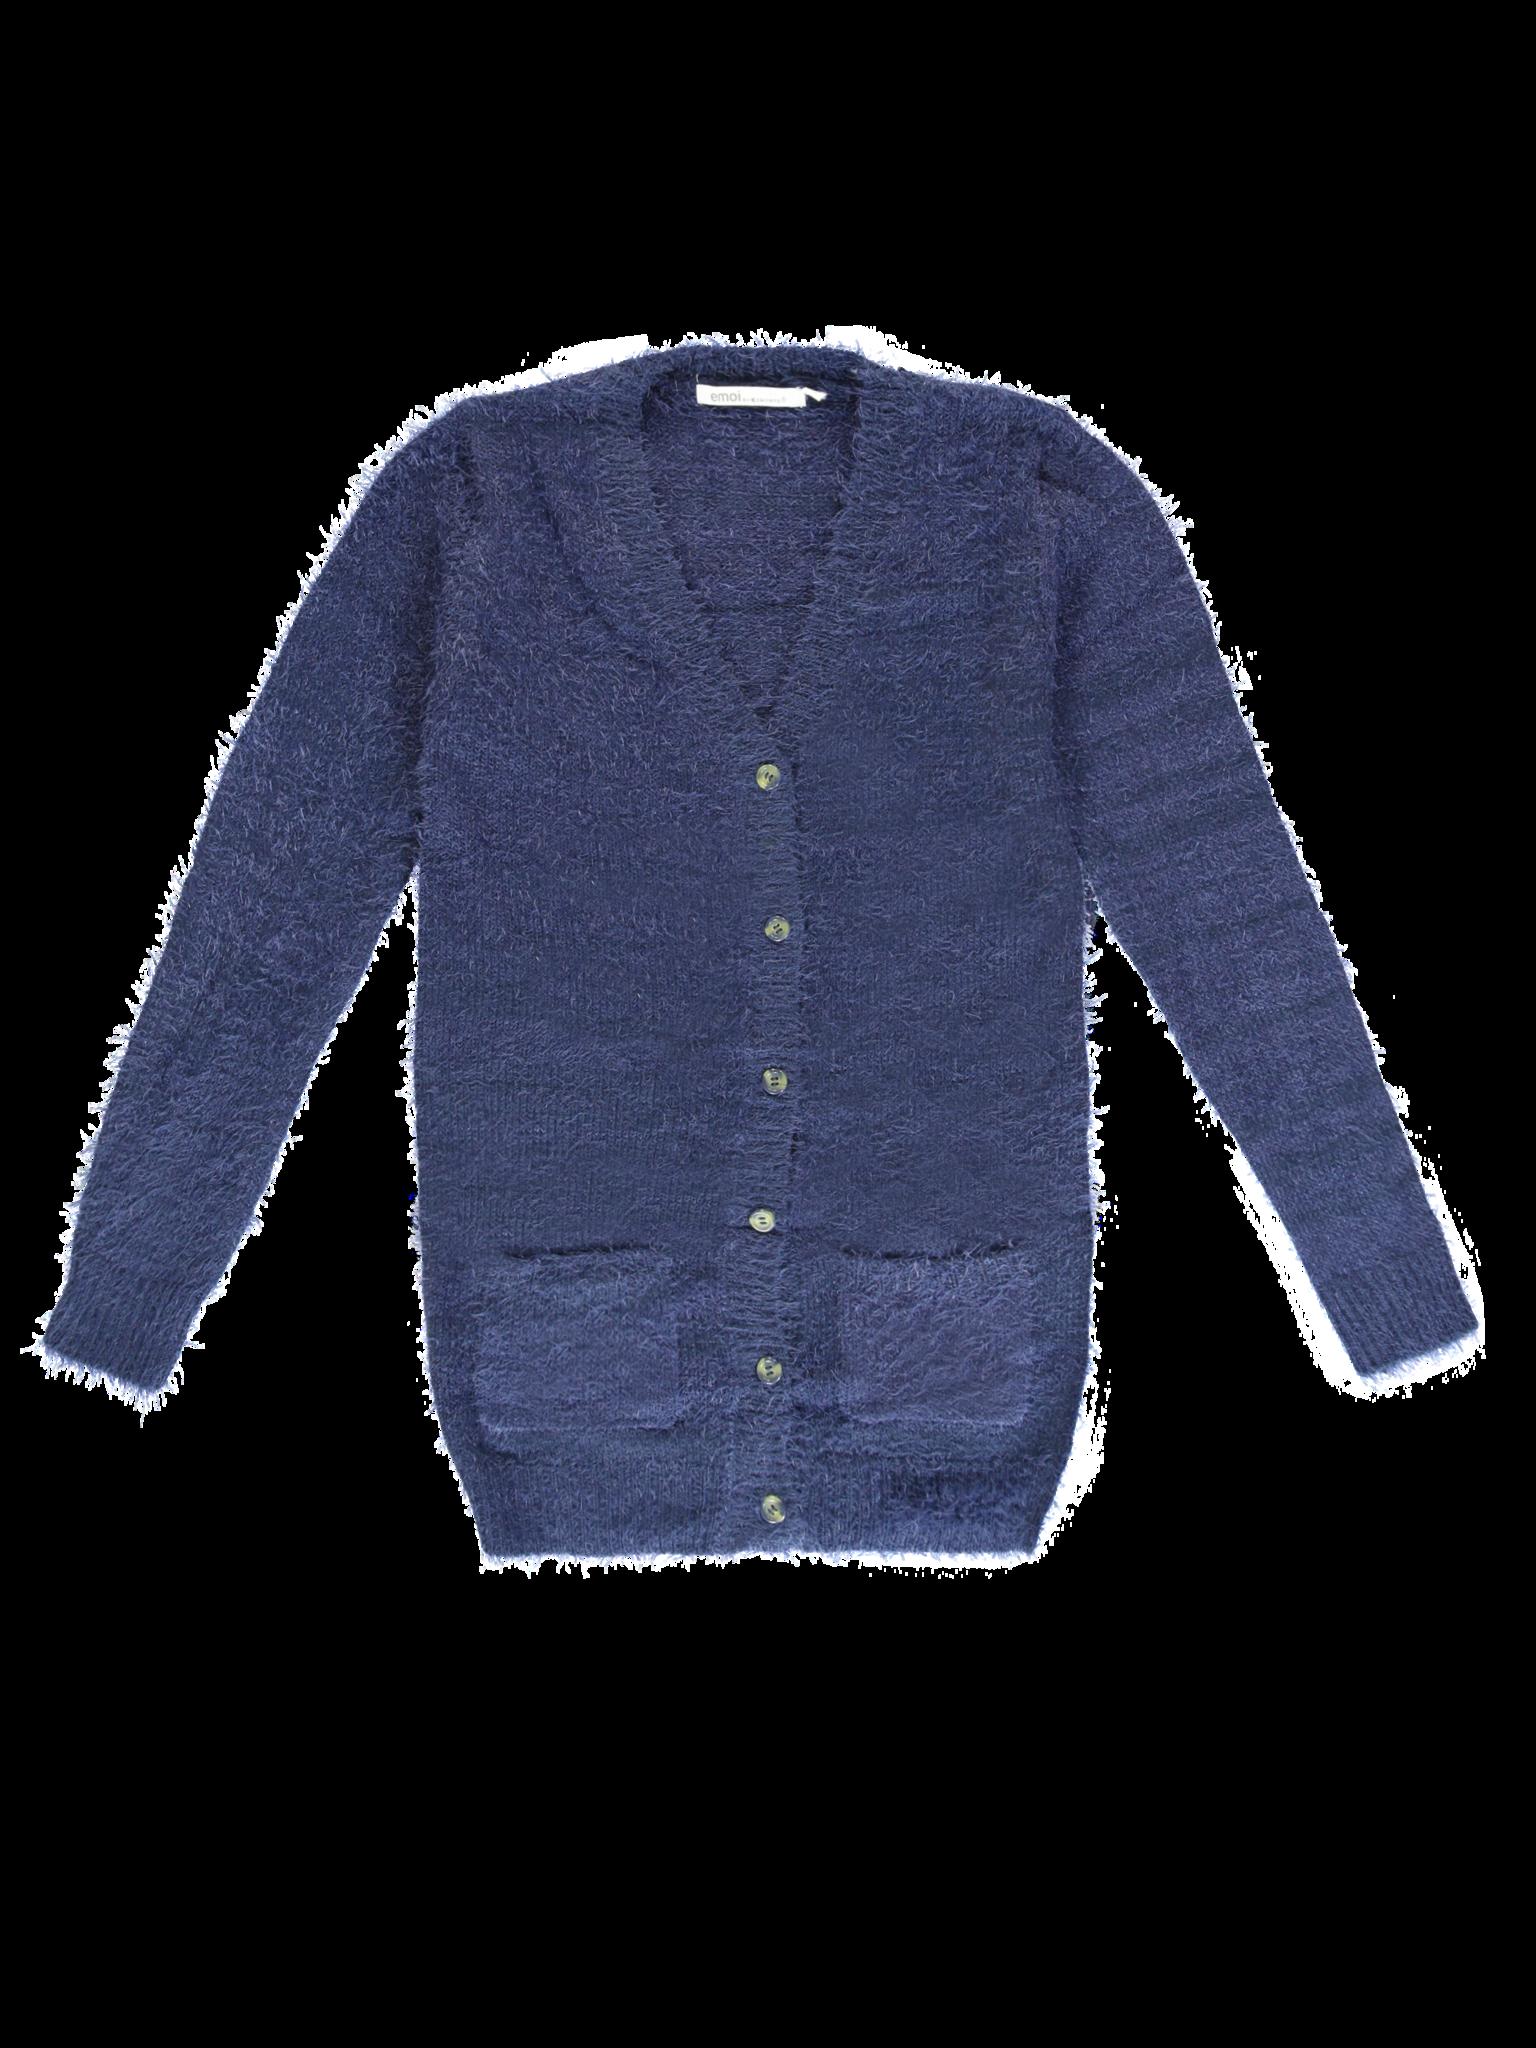 All Brands   Winterproducts Teen Girls   Cardigan Knitwear   24 pcs/box